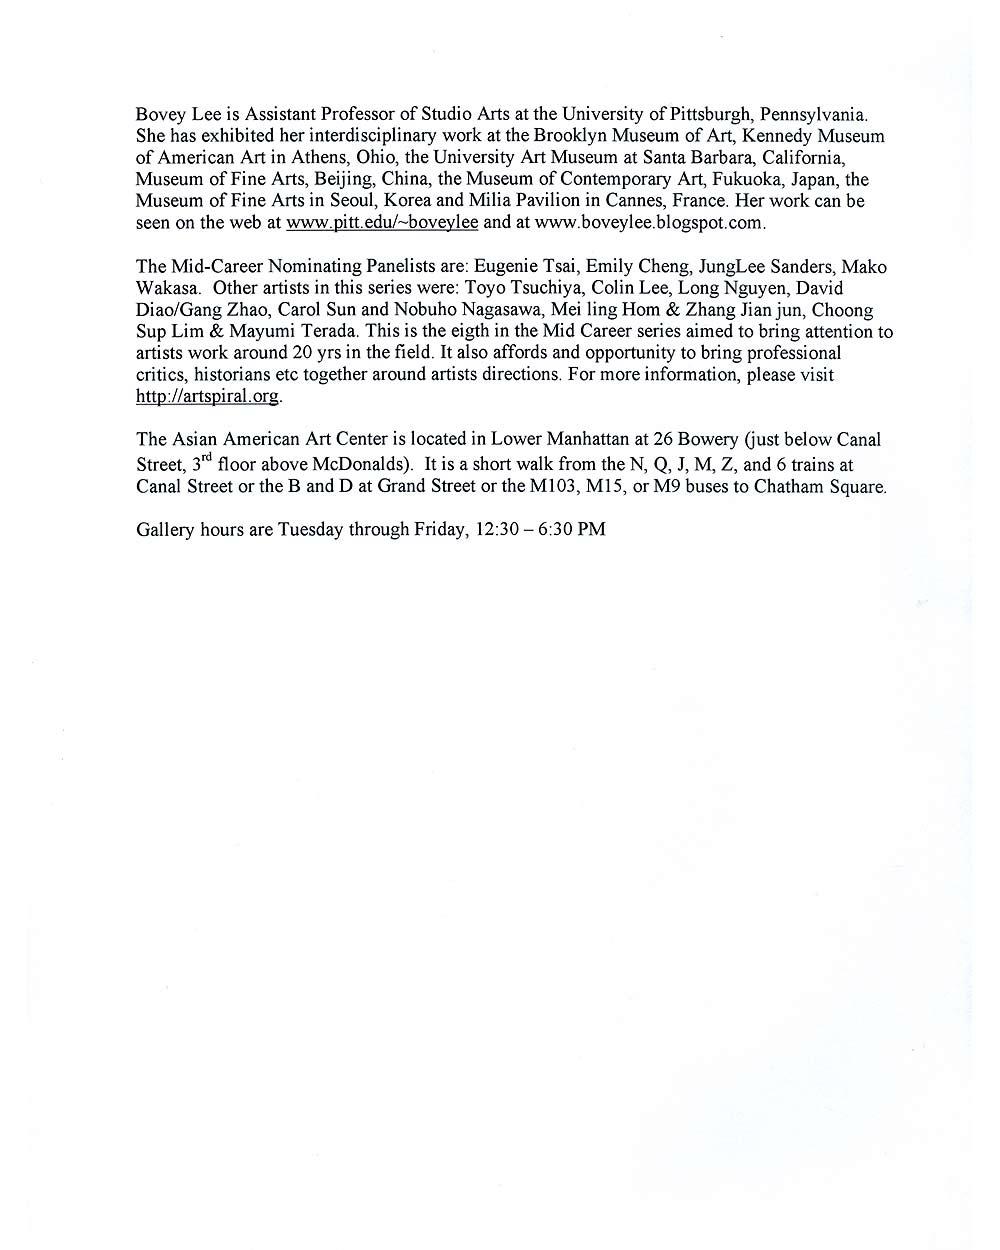 ing Lee/Bovey Lee at Mid-Career, press release, pg 2